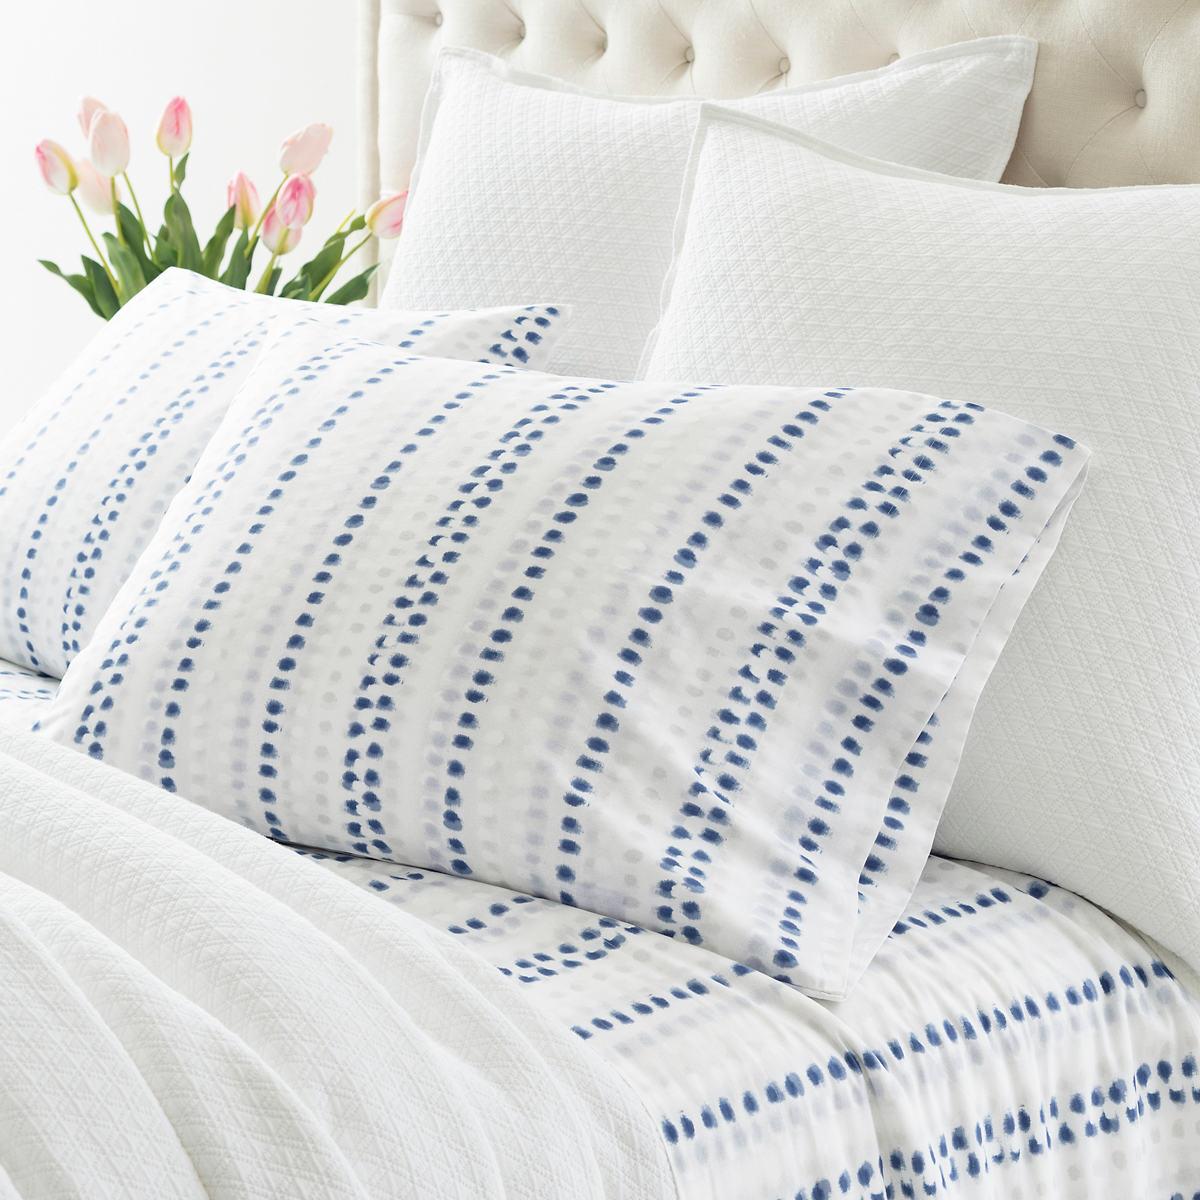 Ink Dots Pillowcases (Pair)